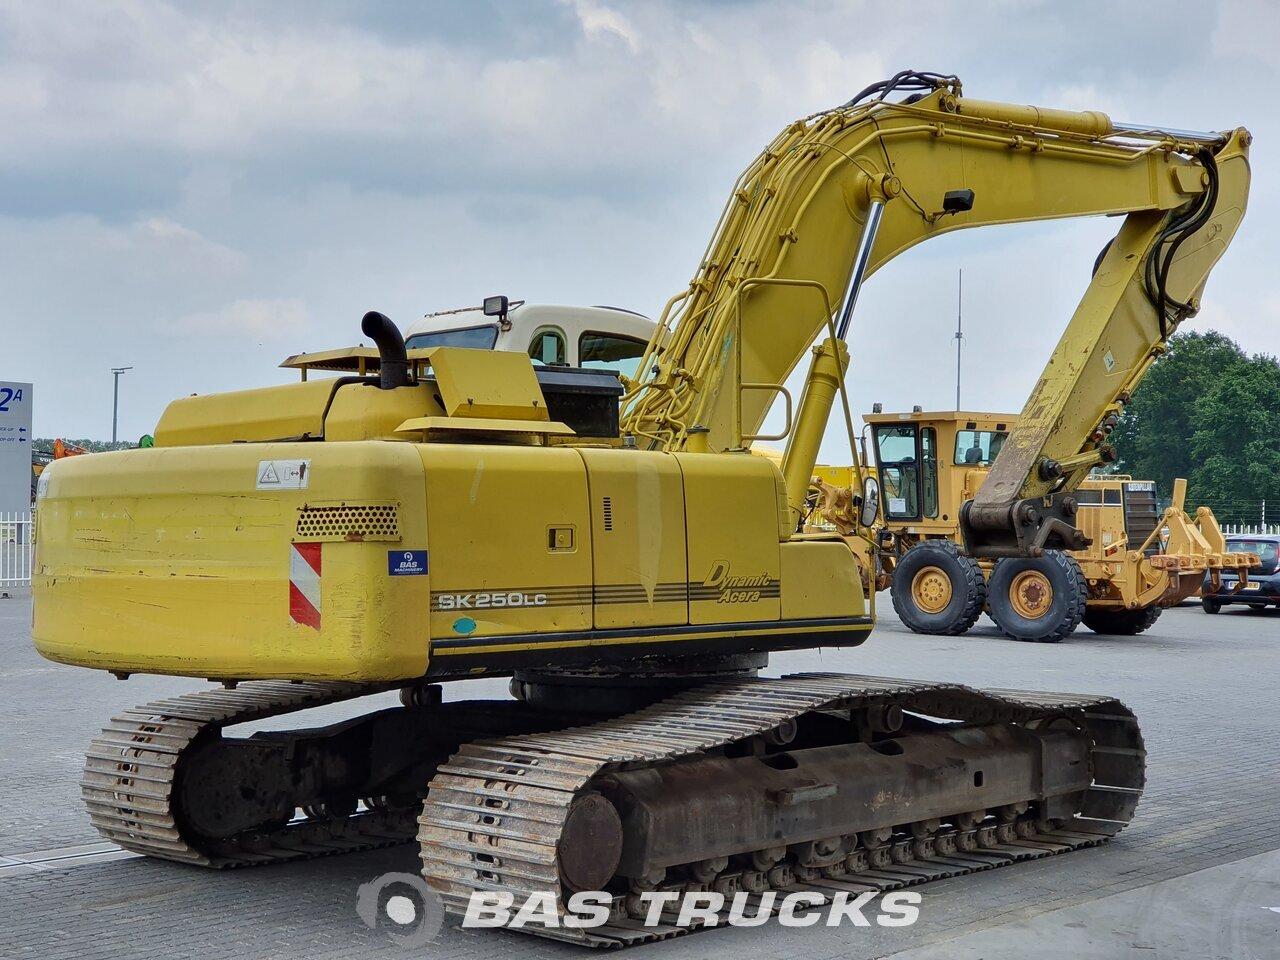 For sale at BAS Trucks: Kobelco SK 250 LC Track 01/2003